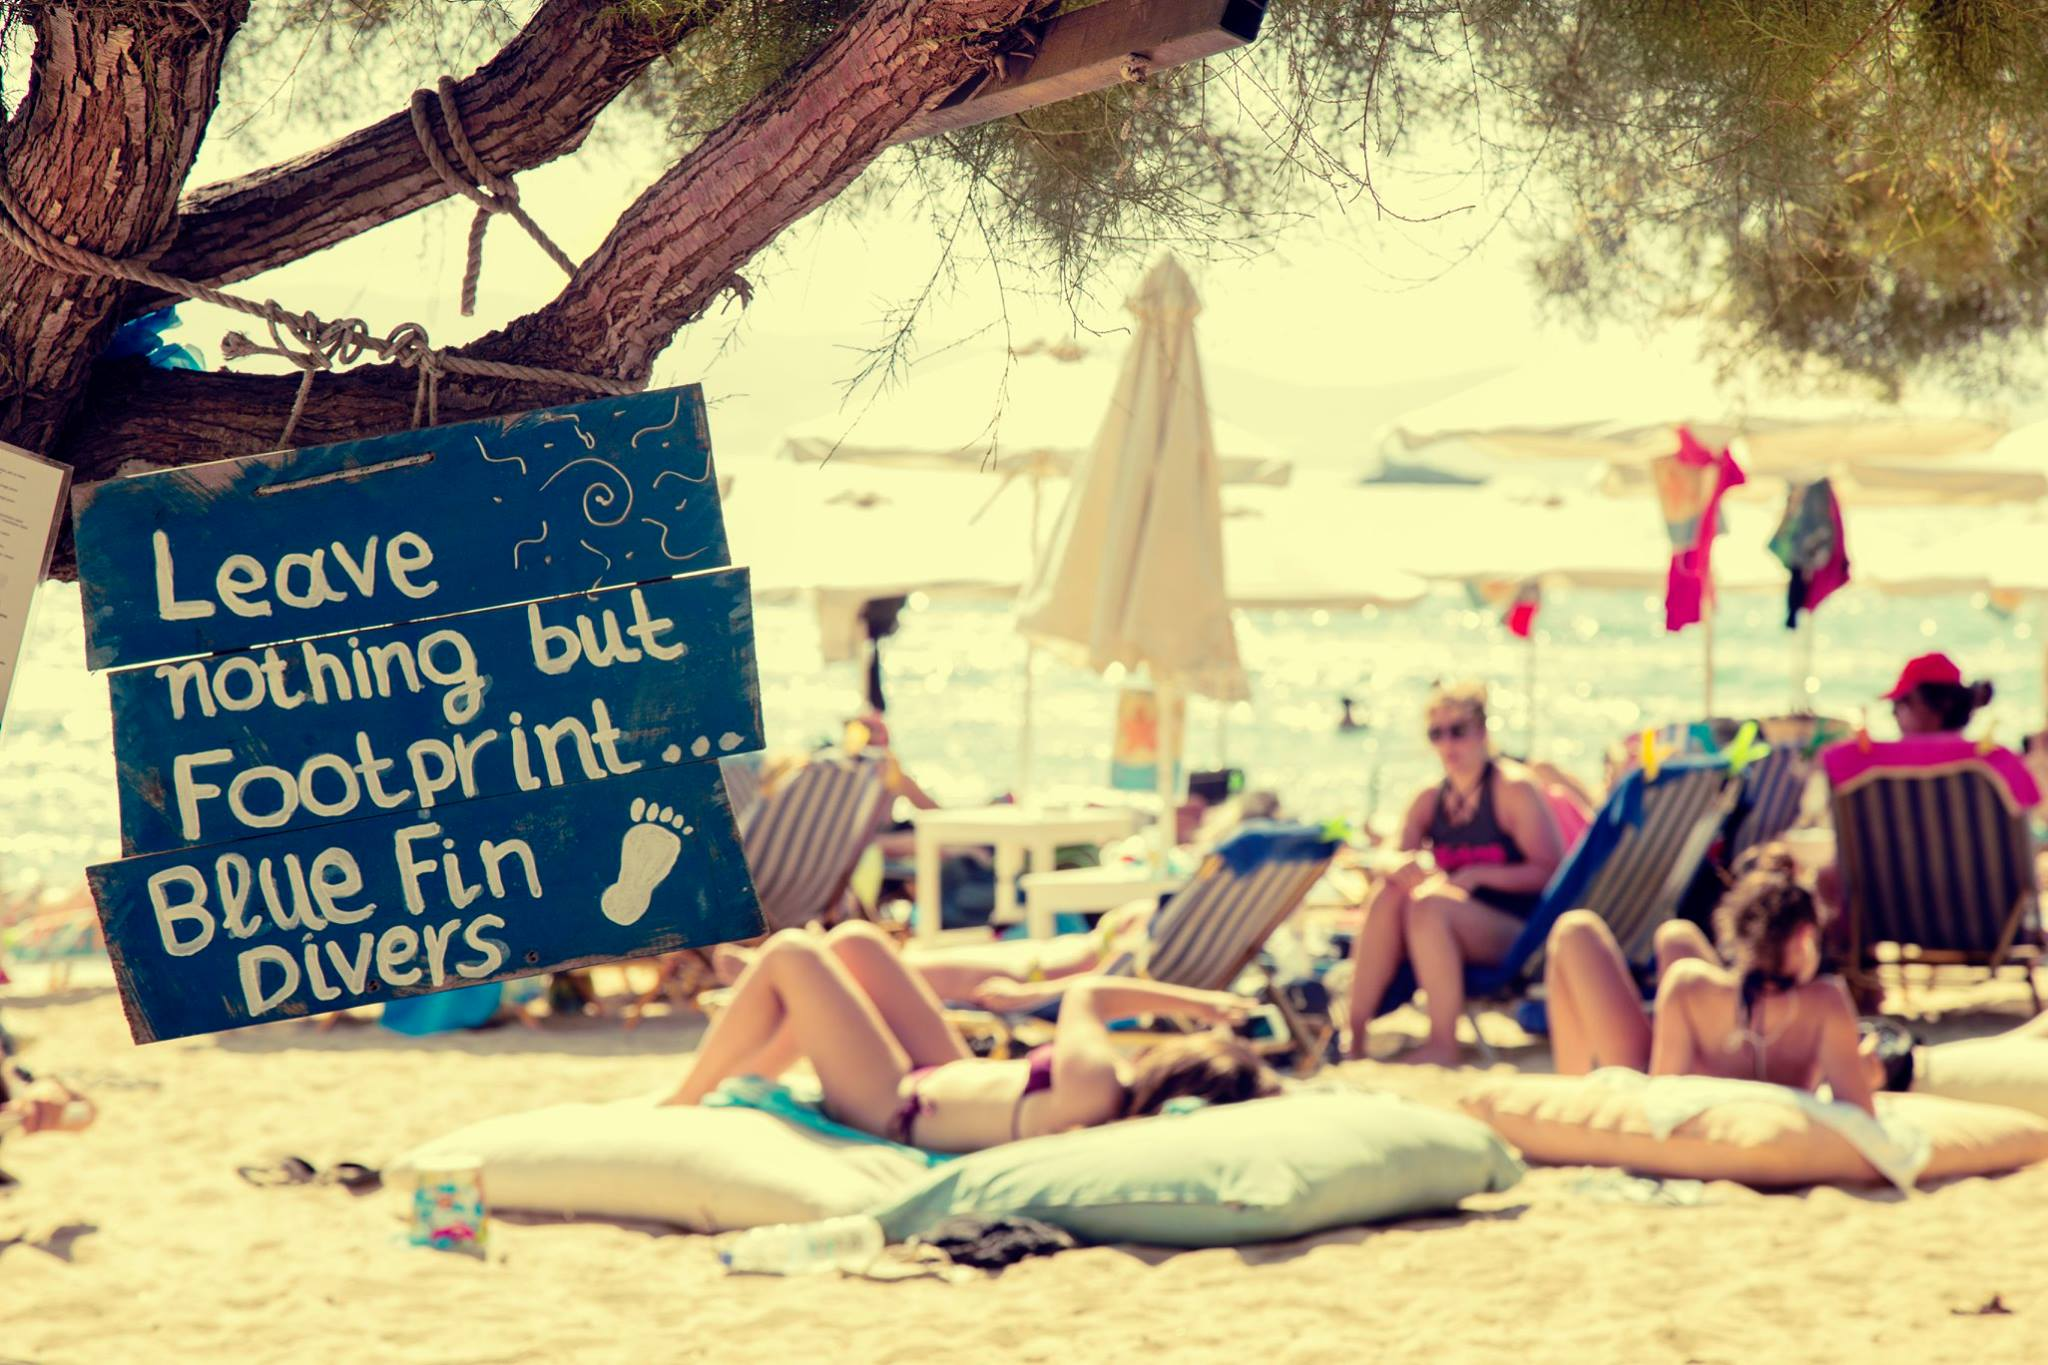 blue fin beach cafe 10